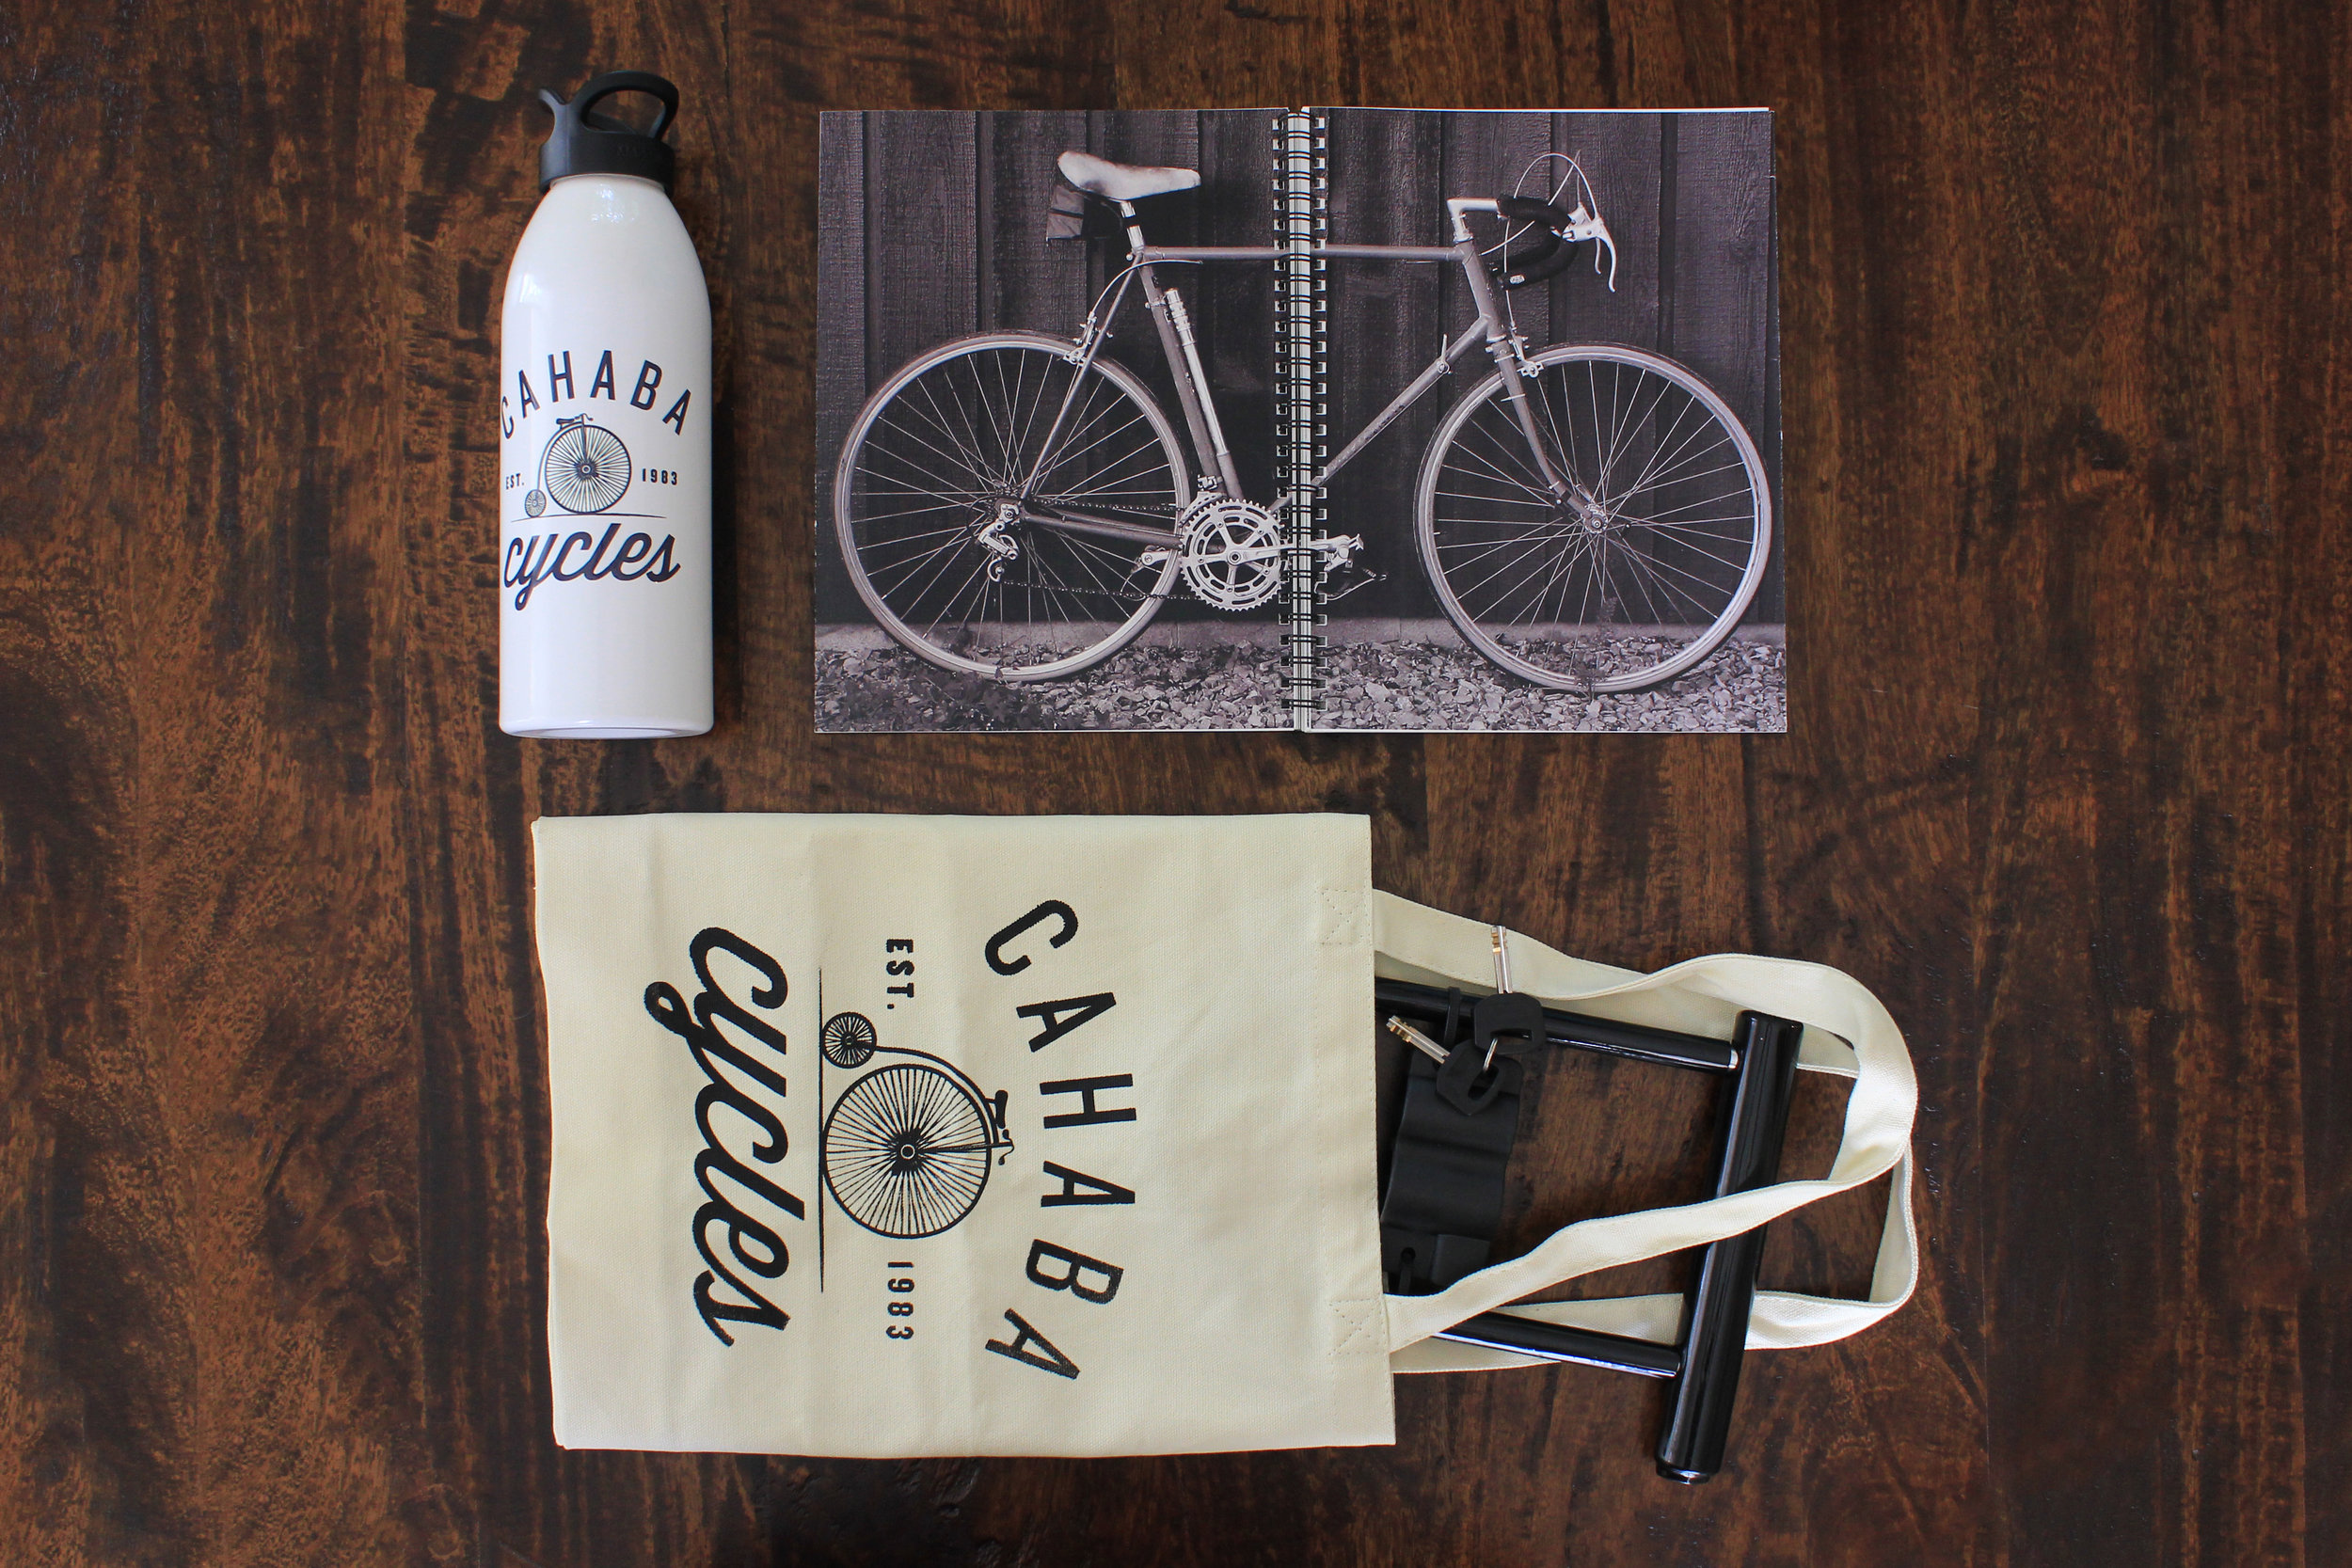 cahaba_cycles1.jpg